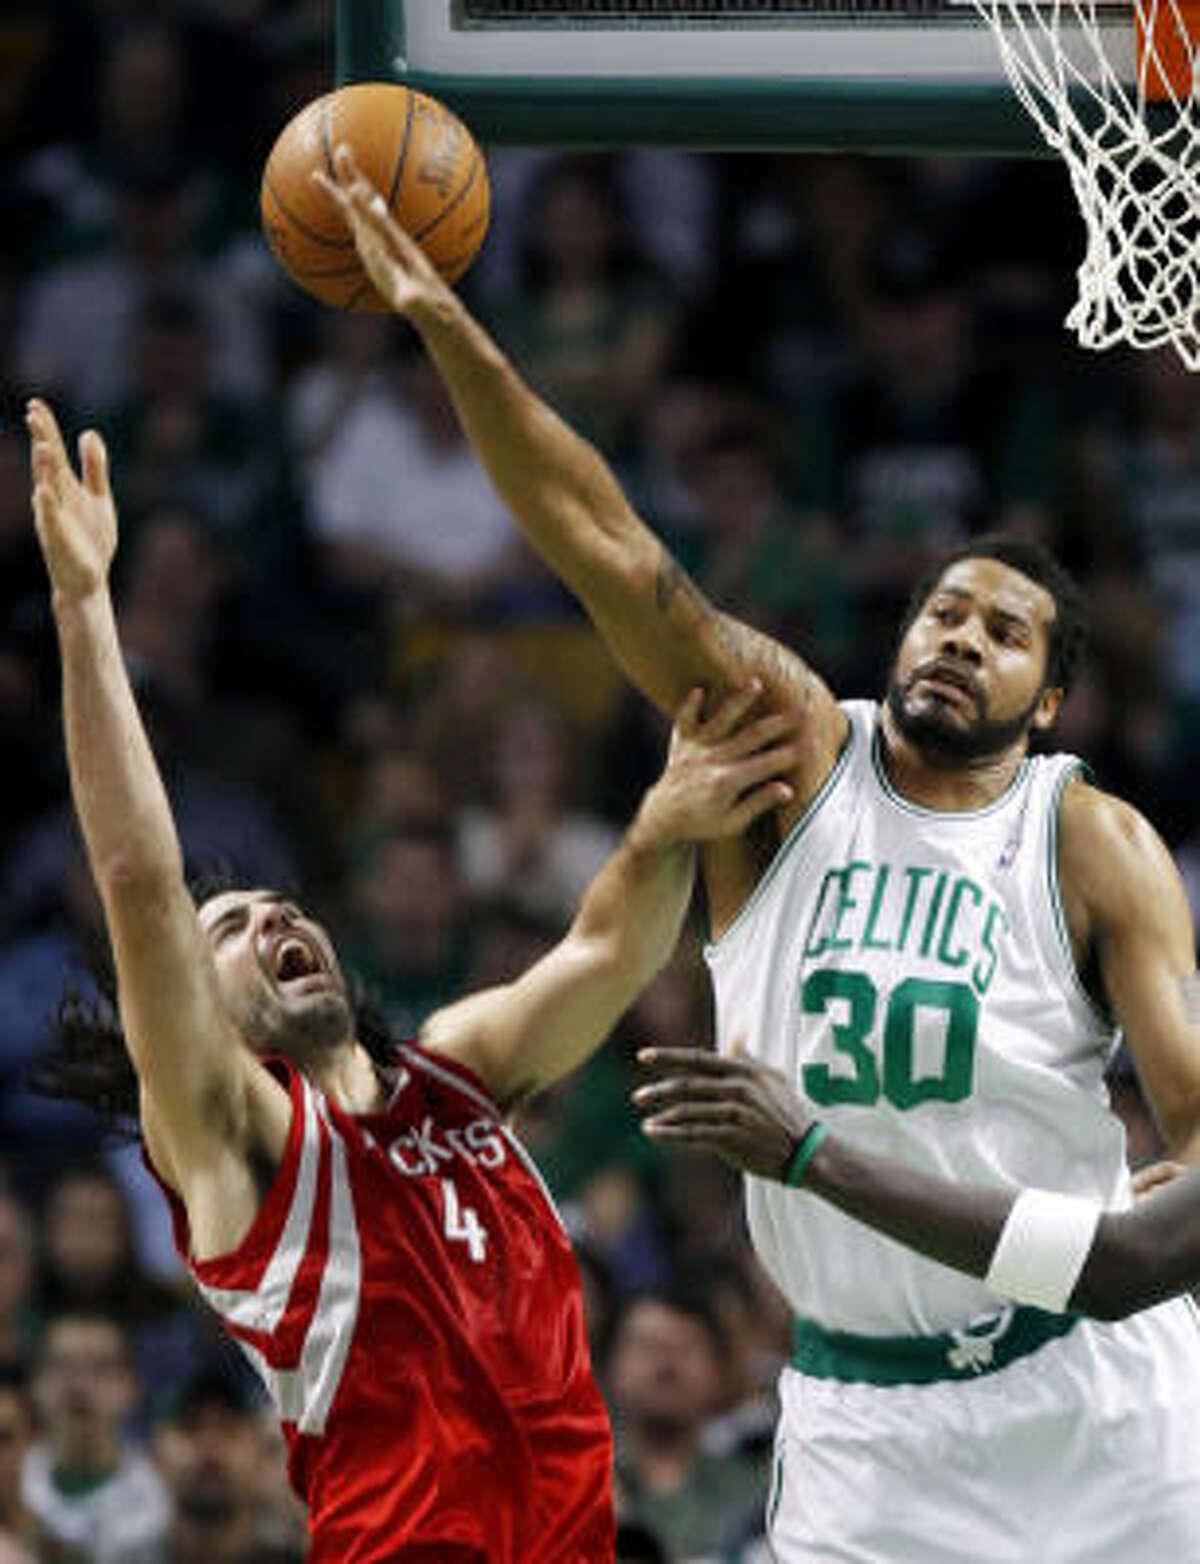 Celtics forward Rasheed Wallace fouls Rockets forward Luis Scola.